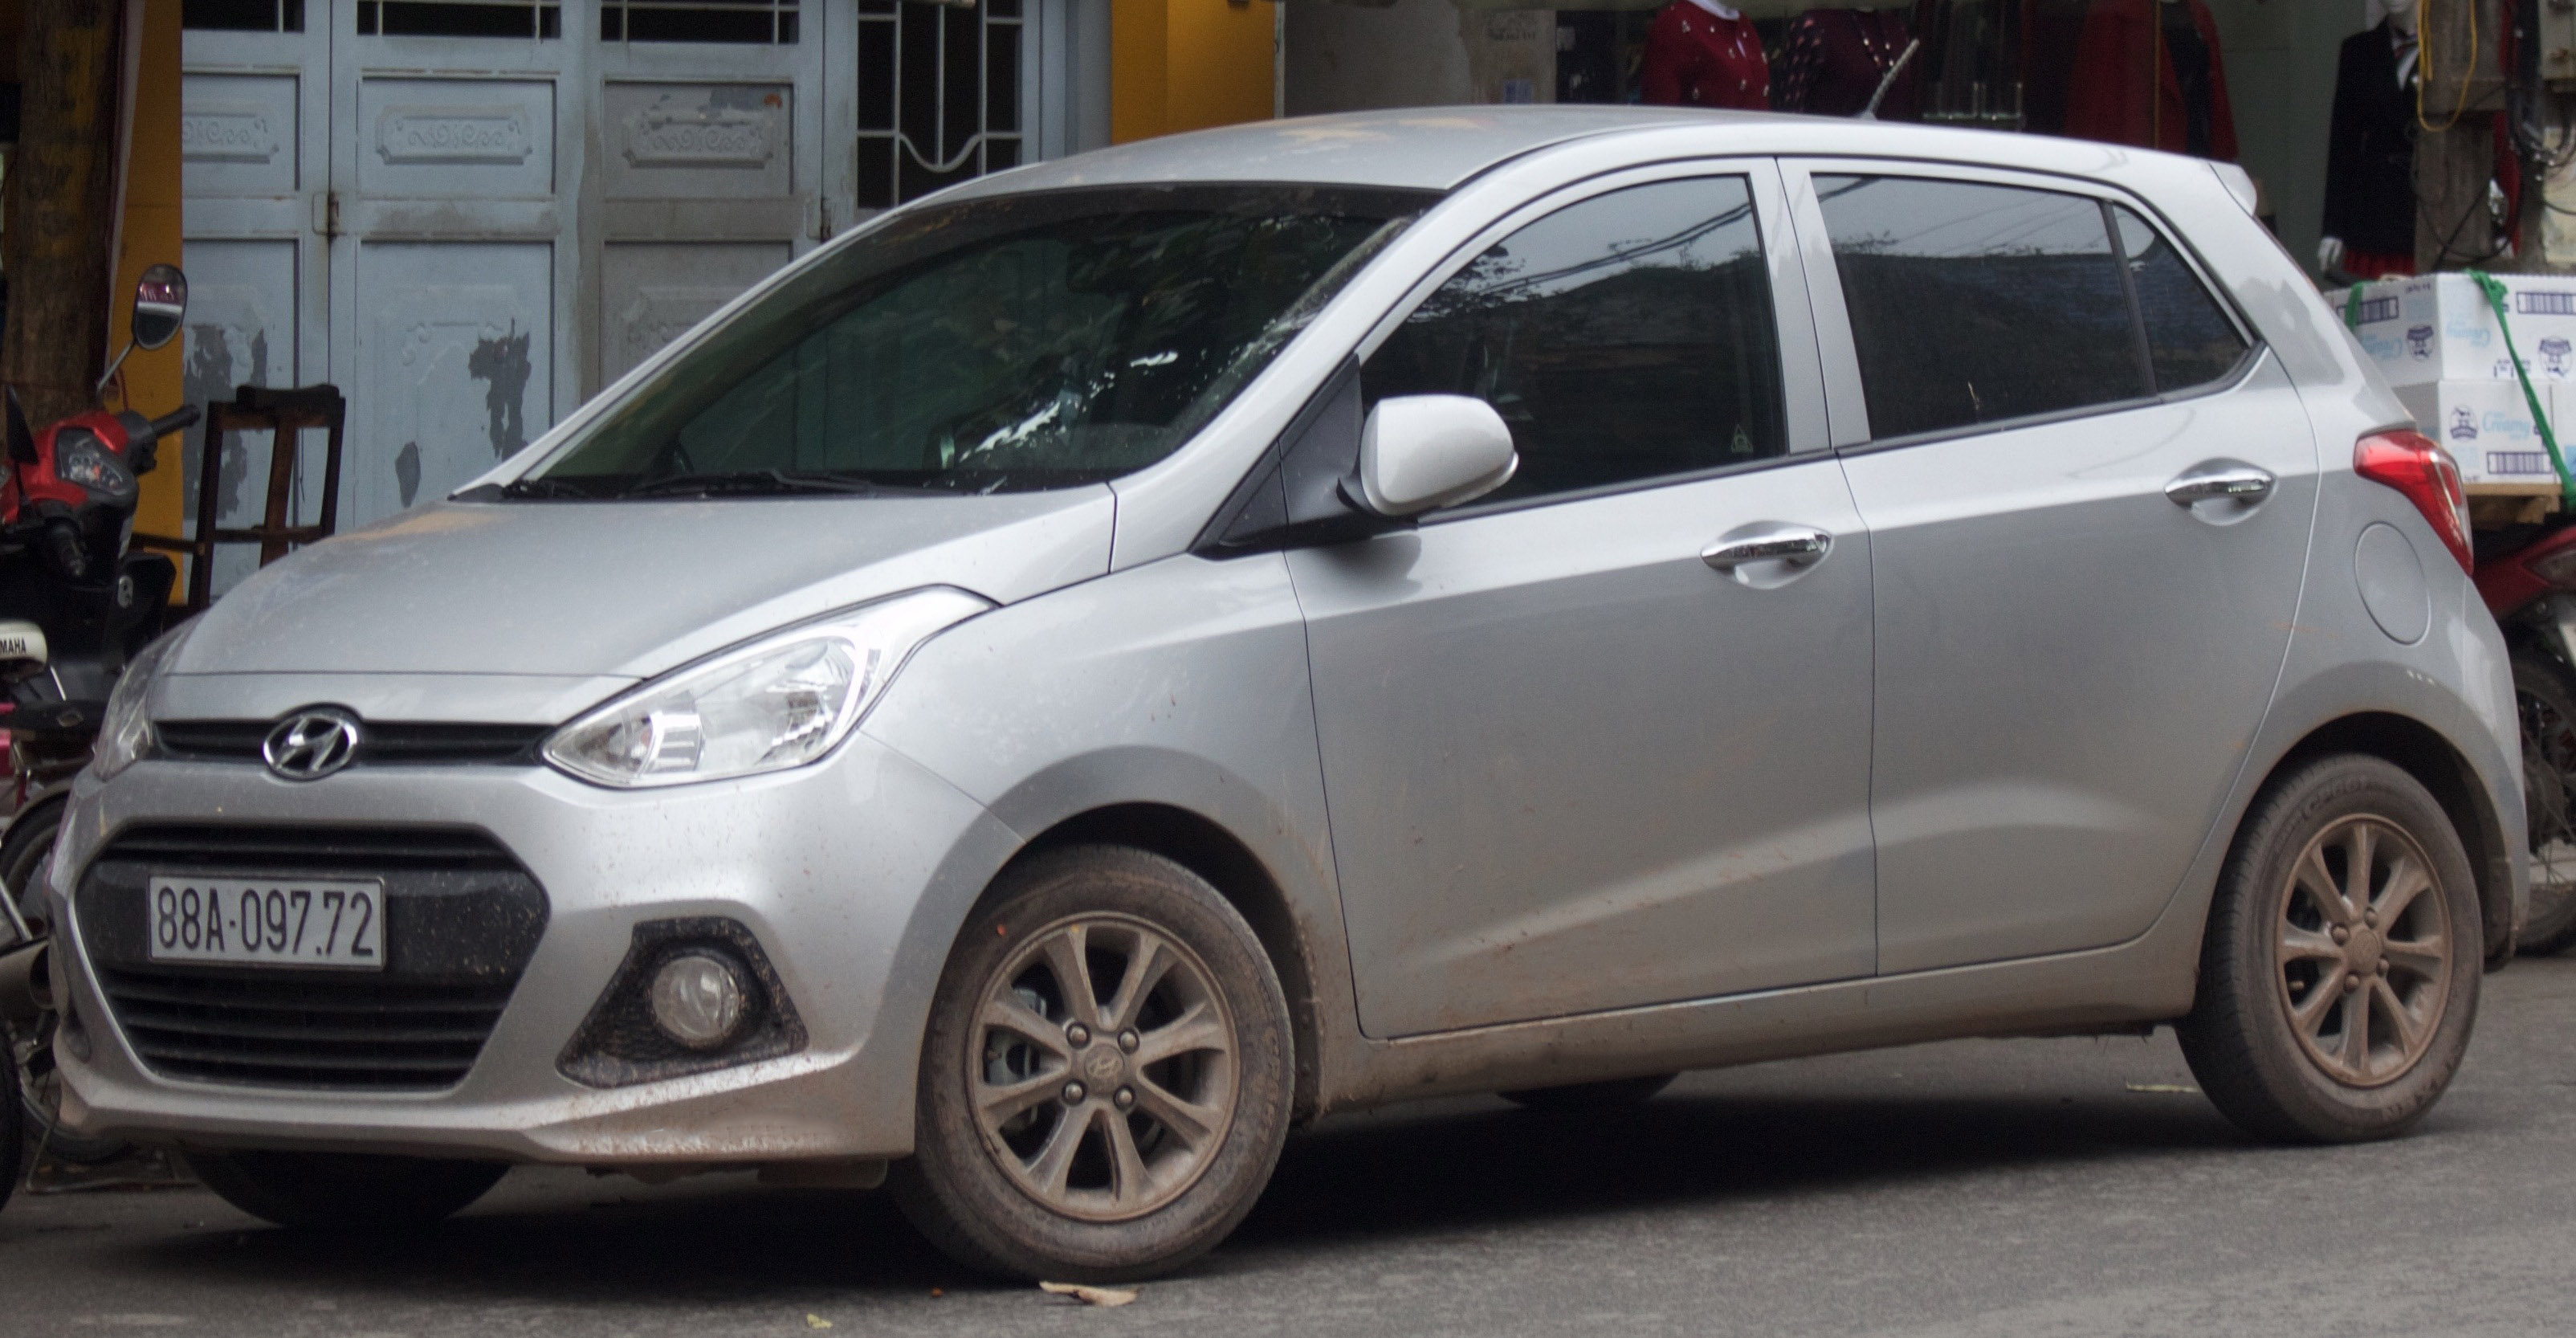 FileSilver Hyundai Grand I10 Front View